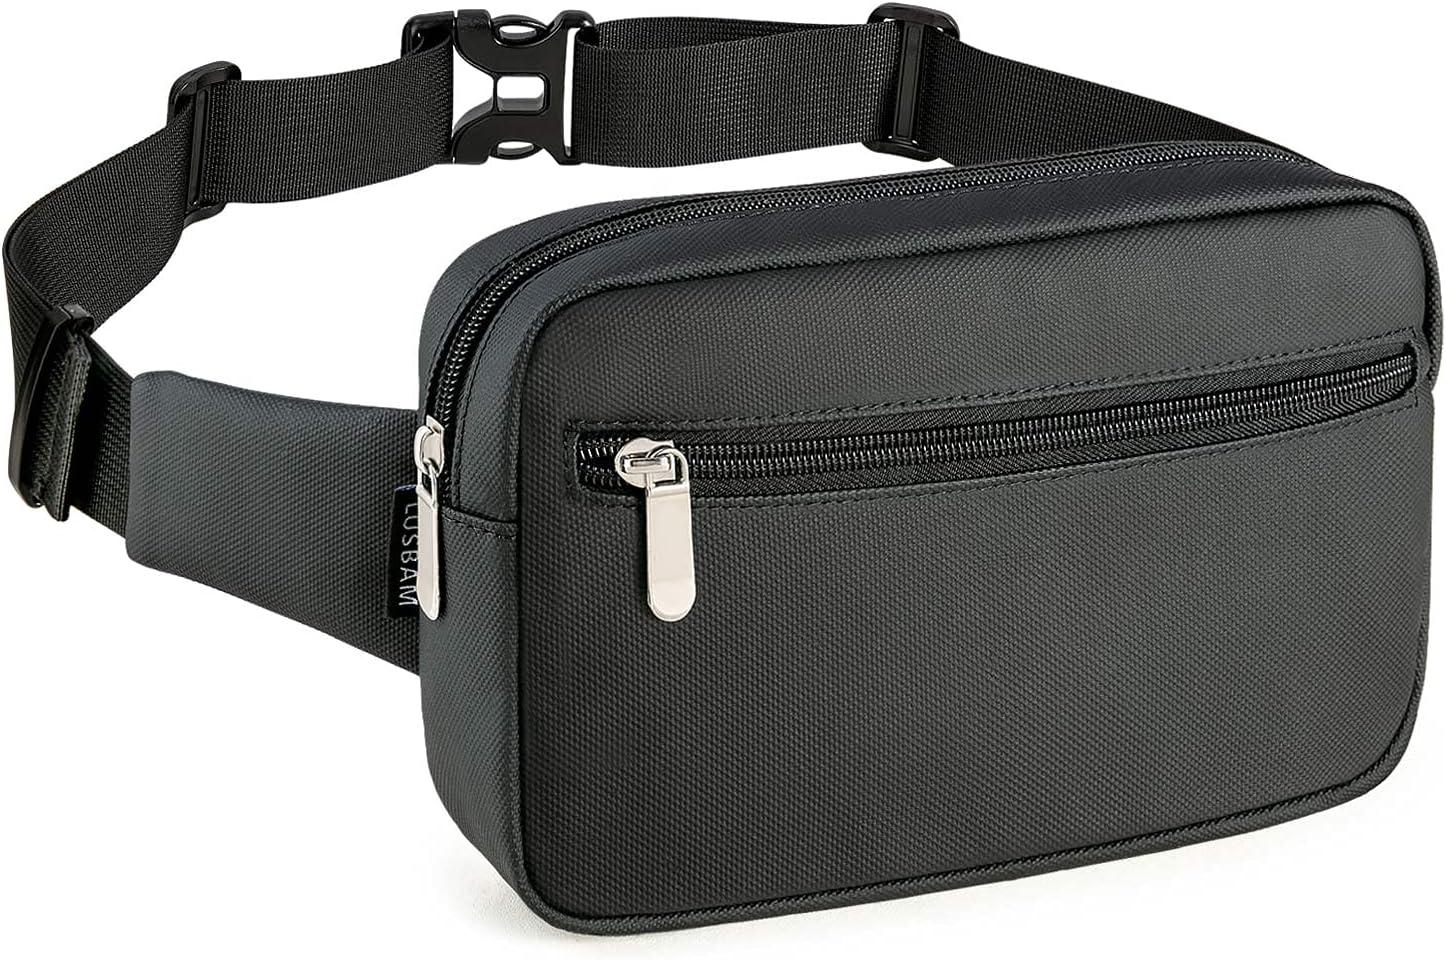 Fanny Fashion Packs for Women Fashionable Men Waist Max 64% OFF Bag Belt Pa